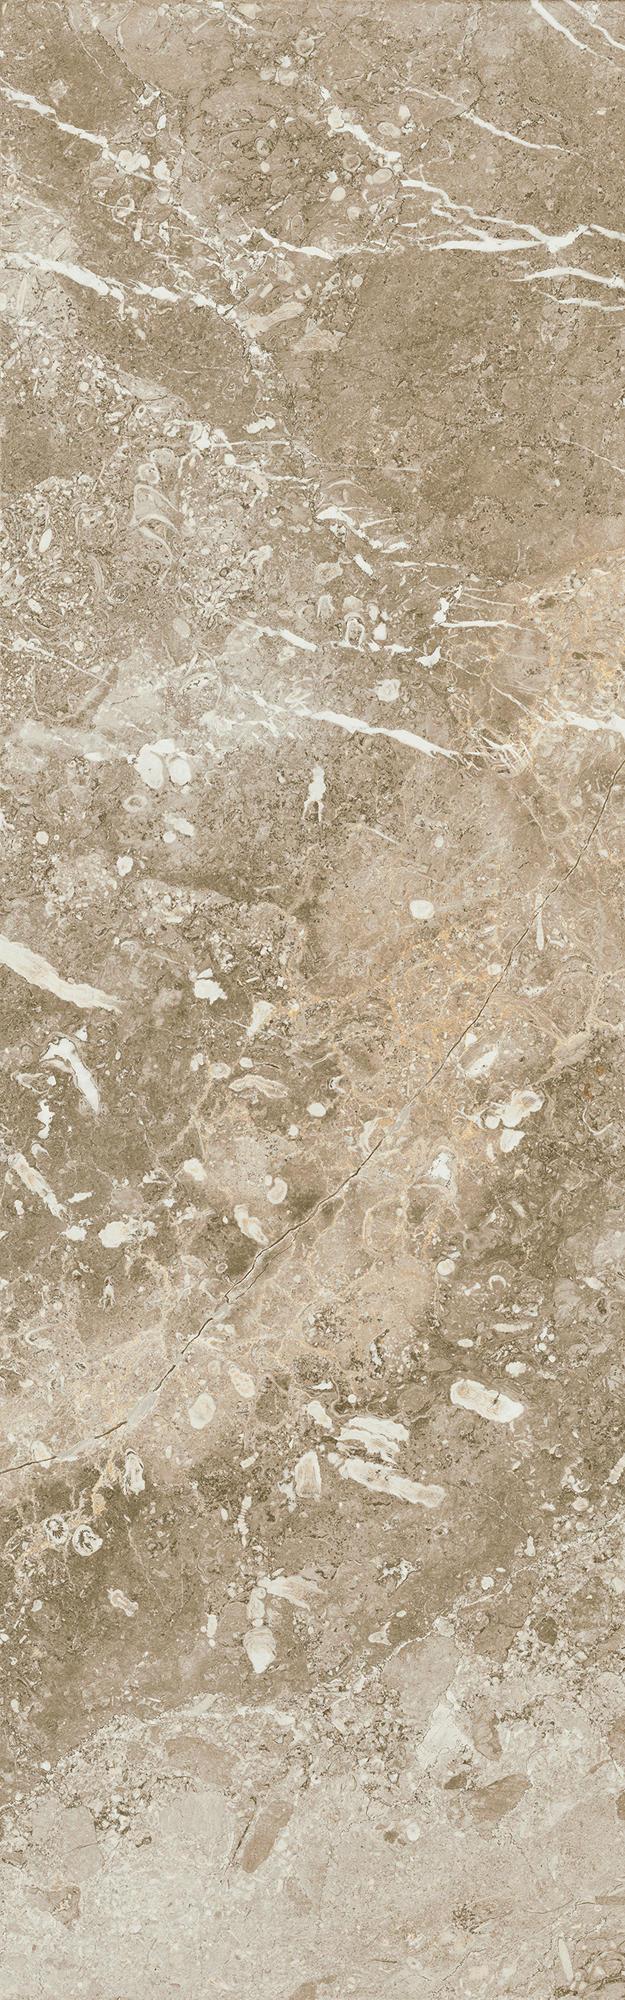 ASTRAL PLANE ALTAIR - Ceramic flooring from Crossville